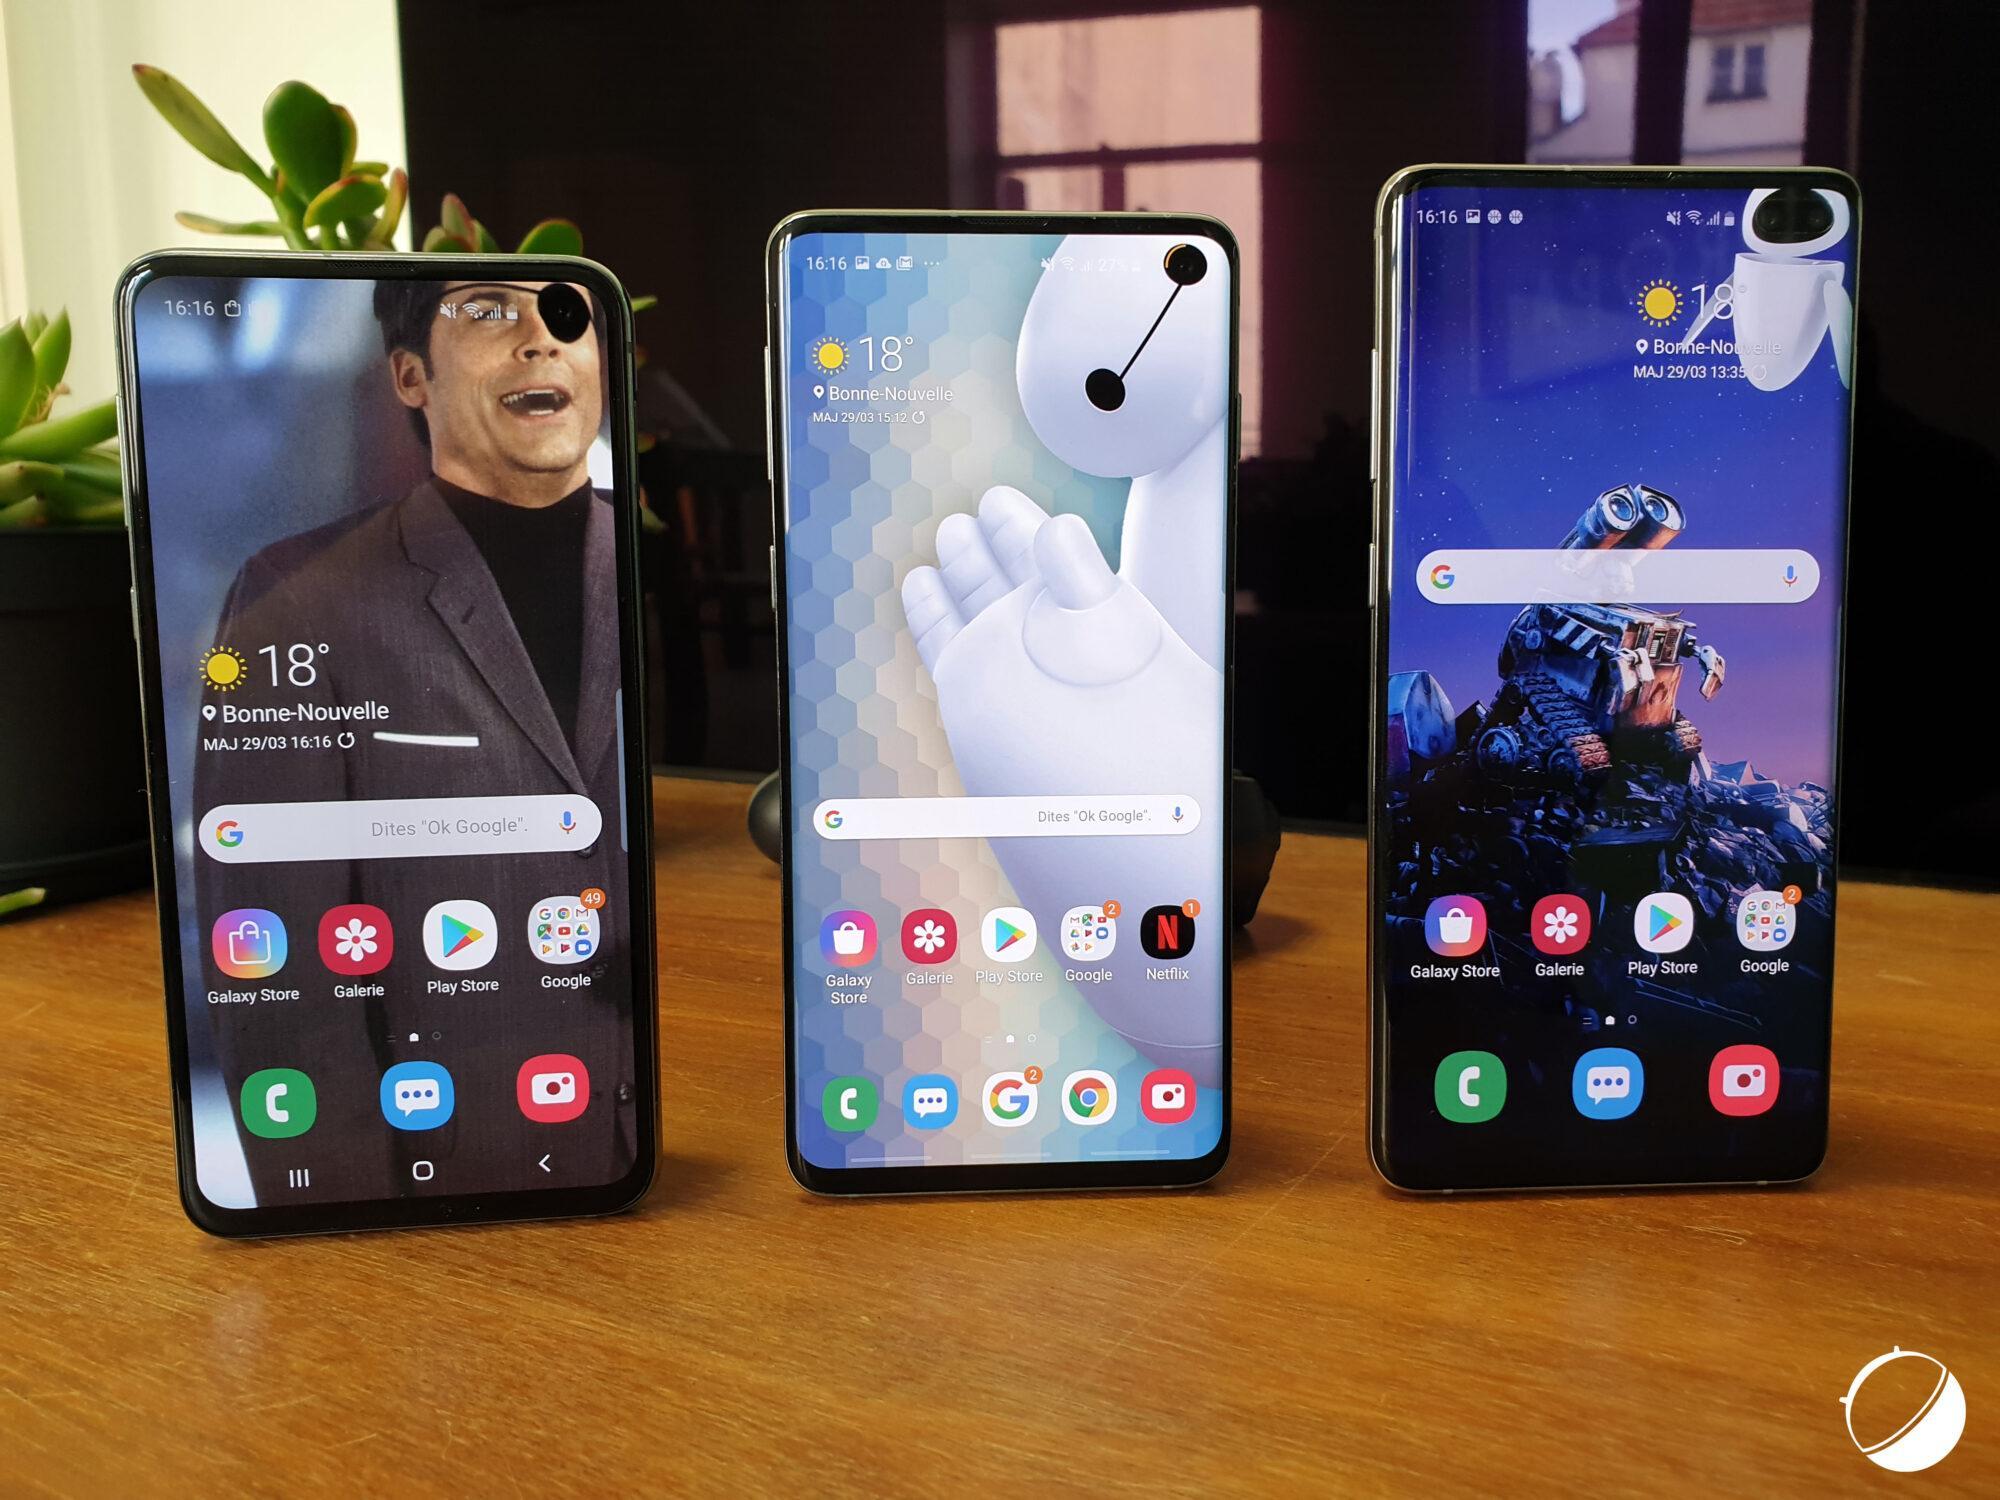 , Samsung reste le leader incontesté du smartphone en Europe